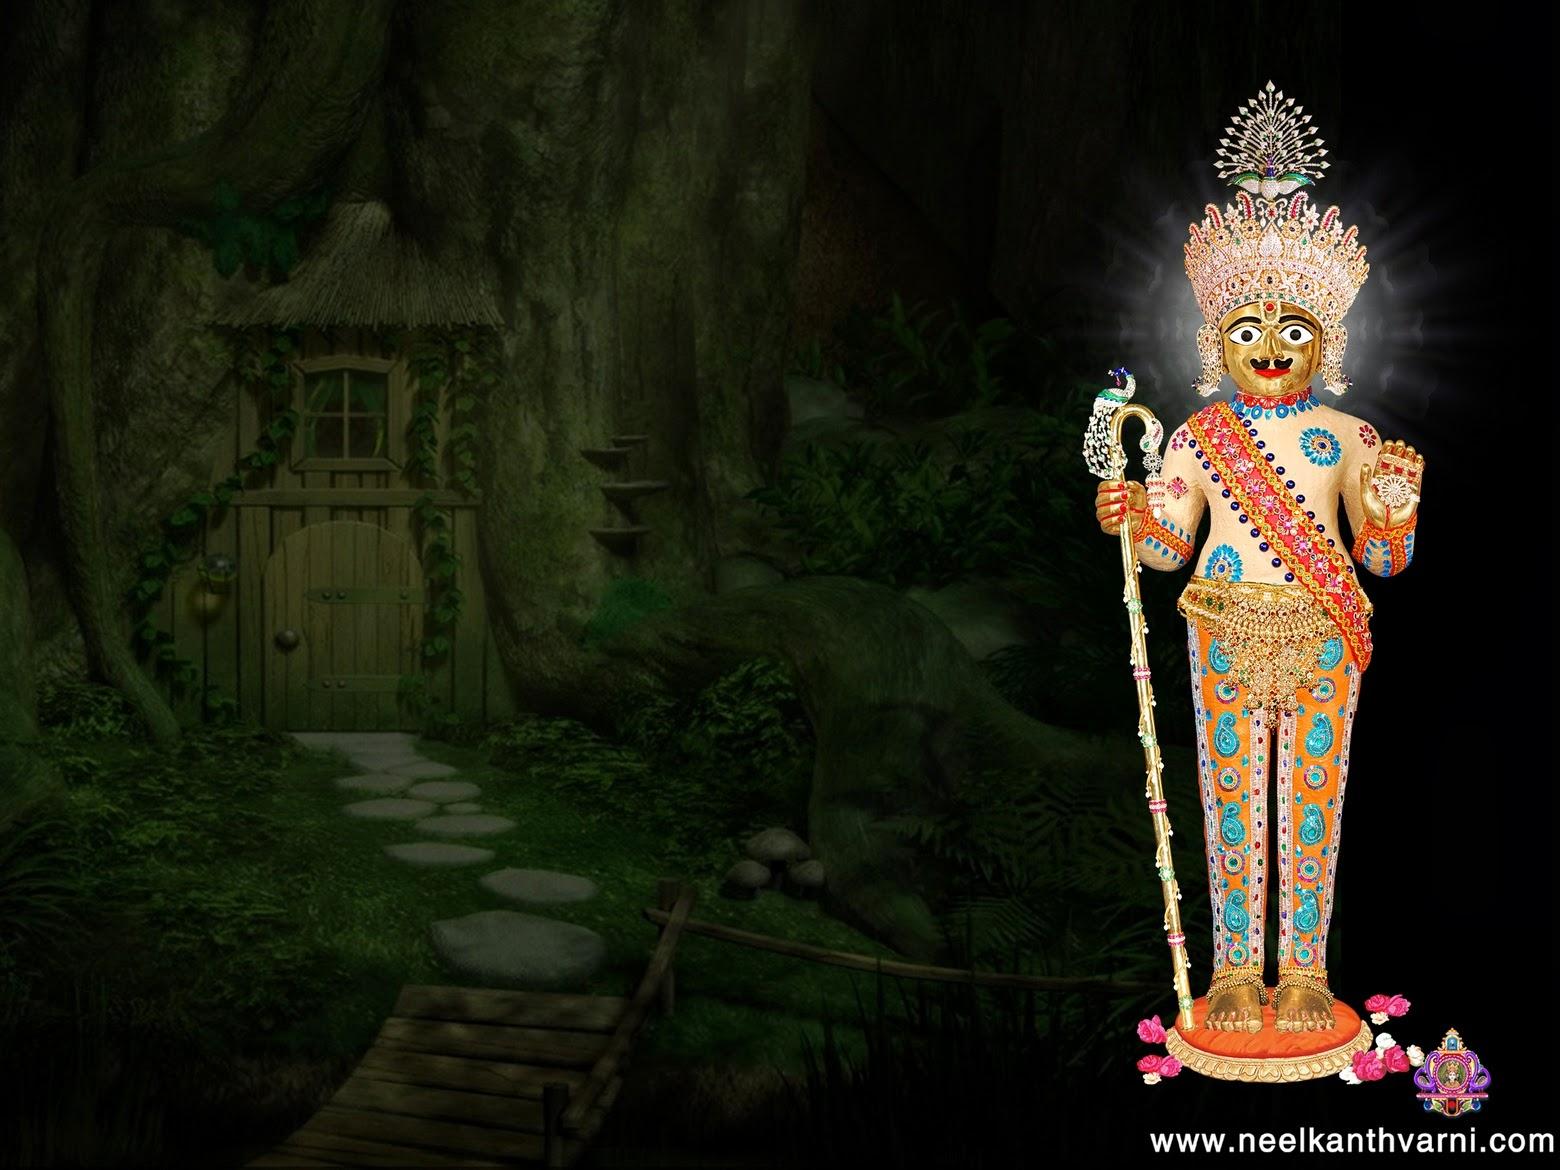 Ghanshyam Maharaj Wallpaper Hd Jay Swaminarayan Wallpapers Happy Diwali With God Hd